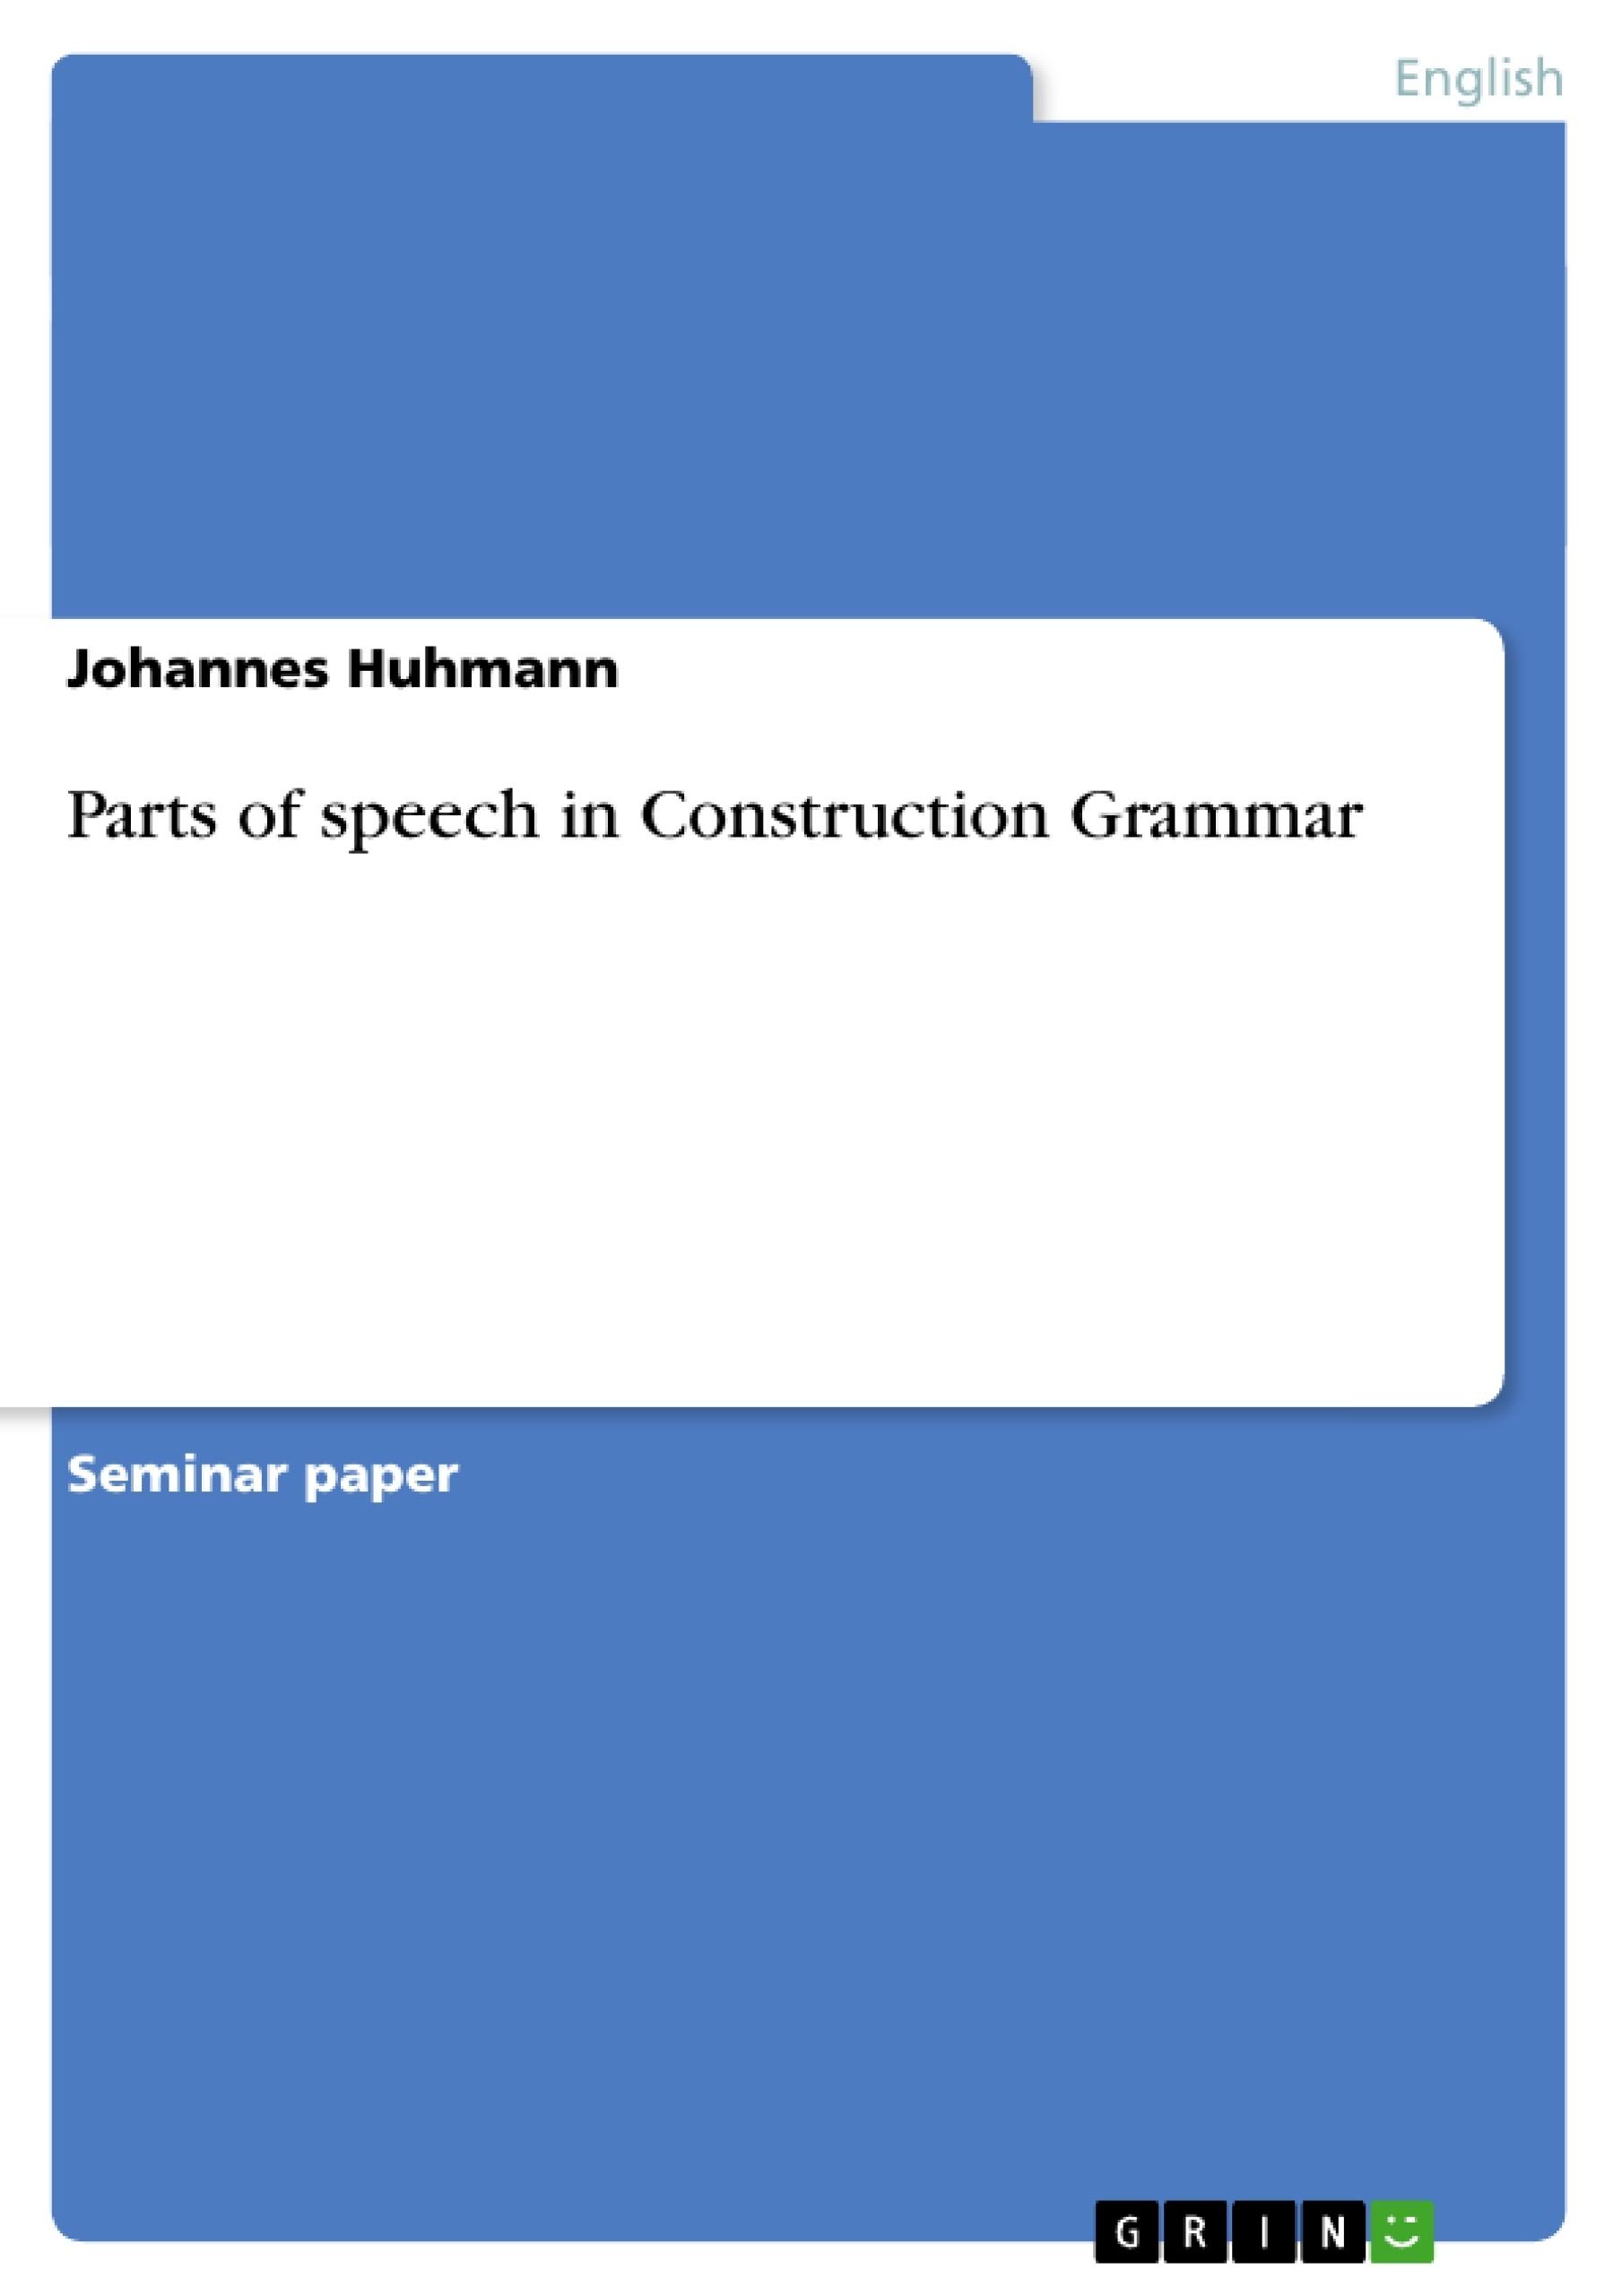 Title: Parts of speech in Construction Grammar